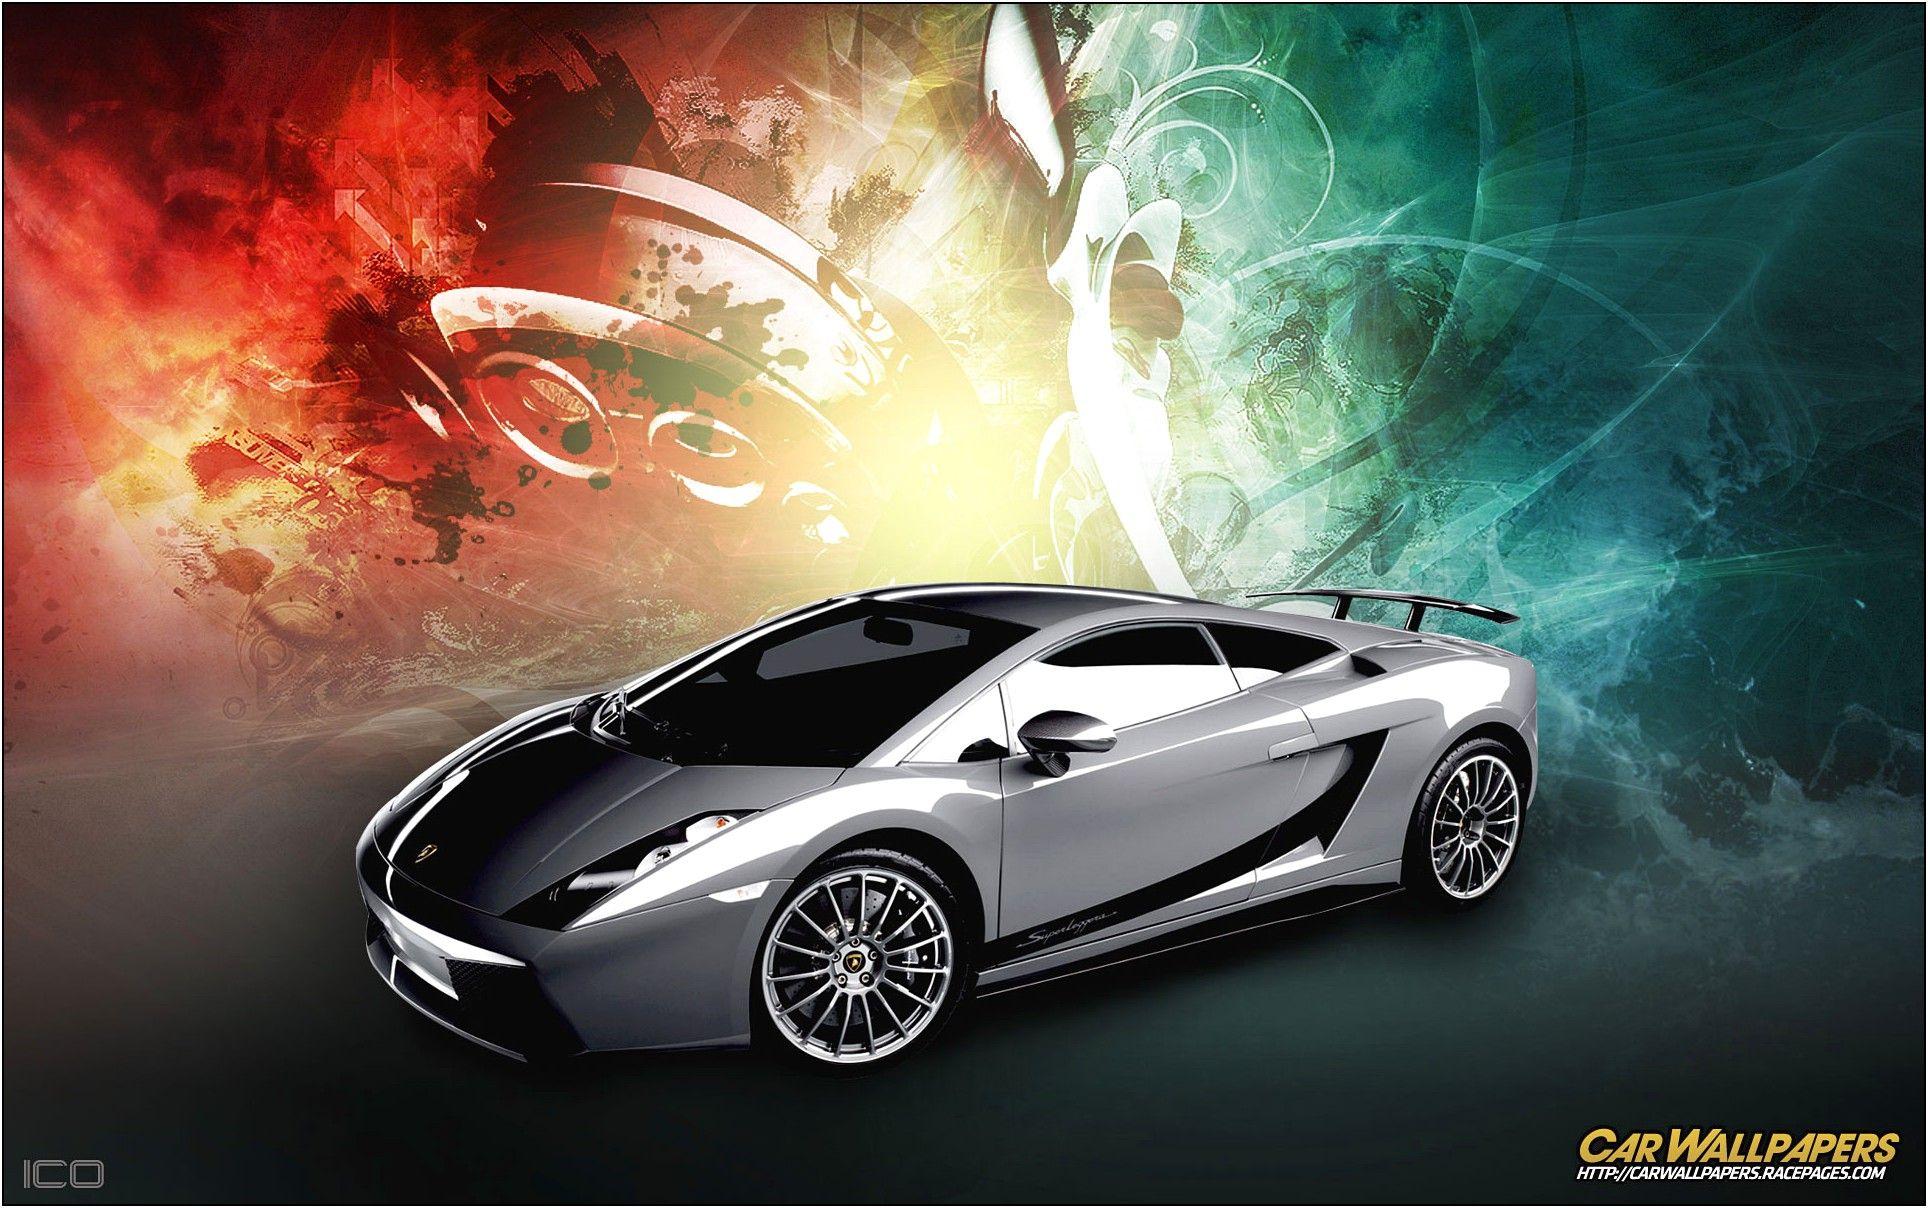 Lamborghini Diablo Wallpaper Best Cars And Supercars Mobil Sport Mobil Keren Lamborghini